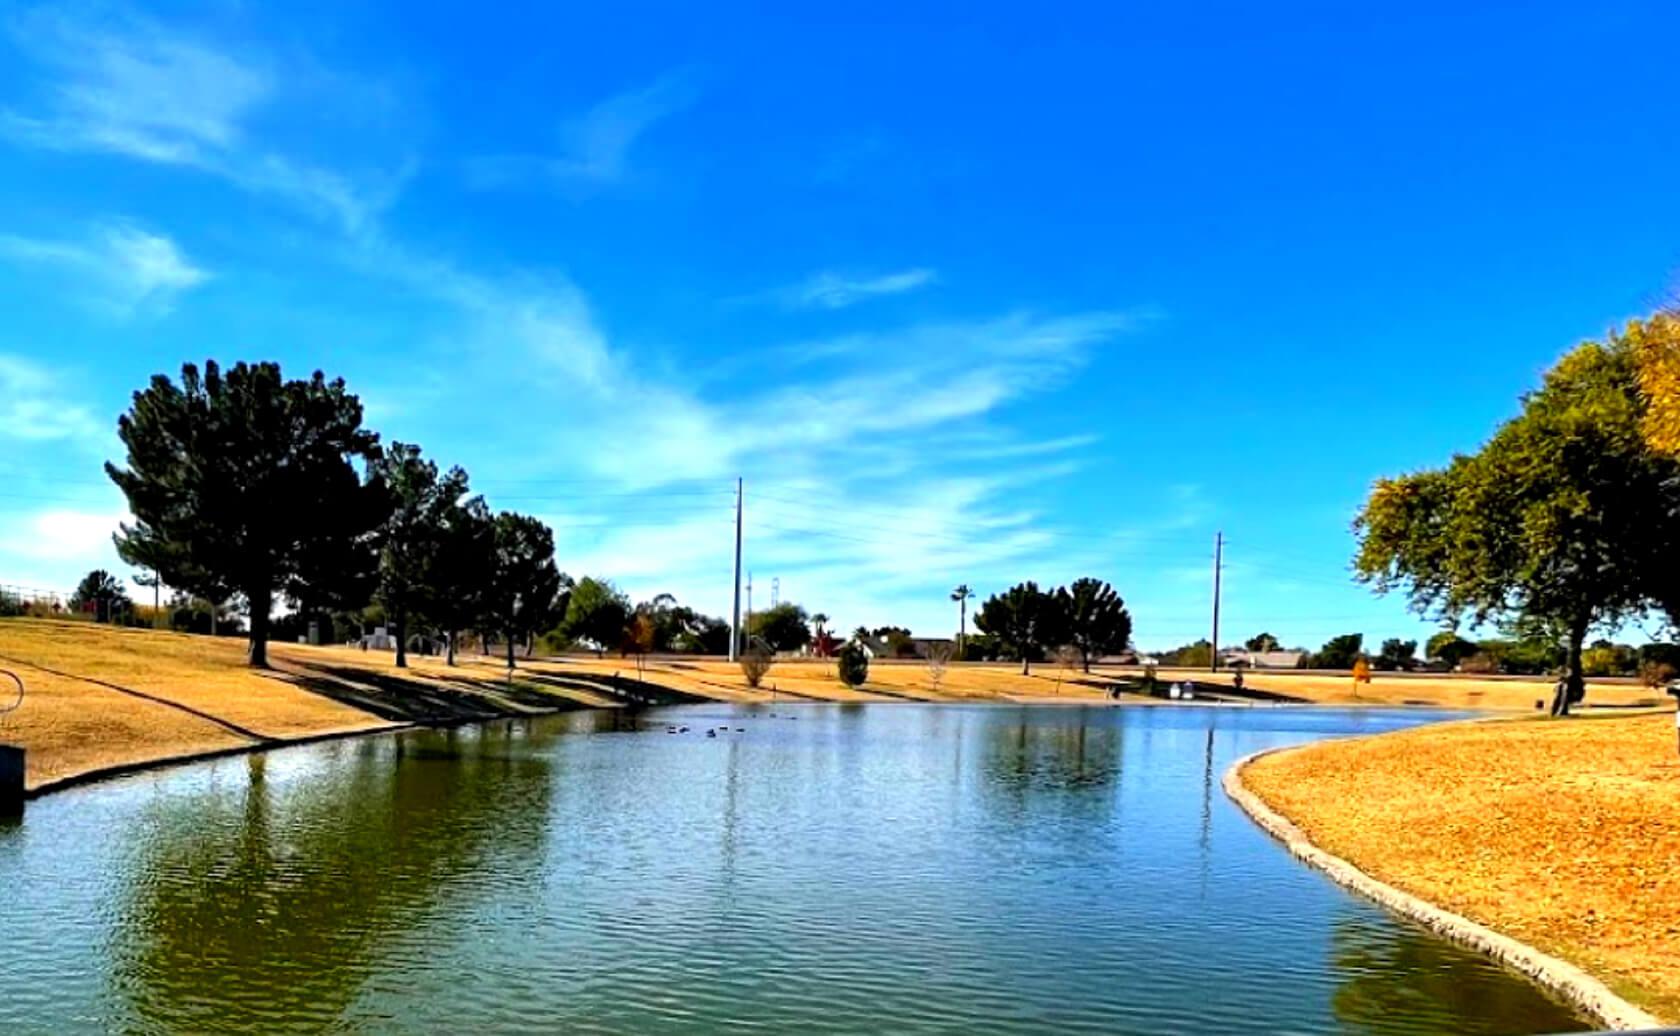 Greenfield-Park-Pond-Lake-Fishing-Guide-Report-Mesa-AZ-03